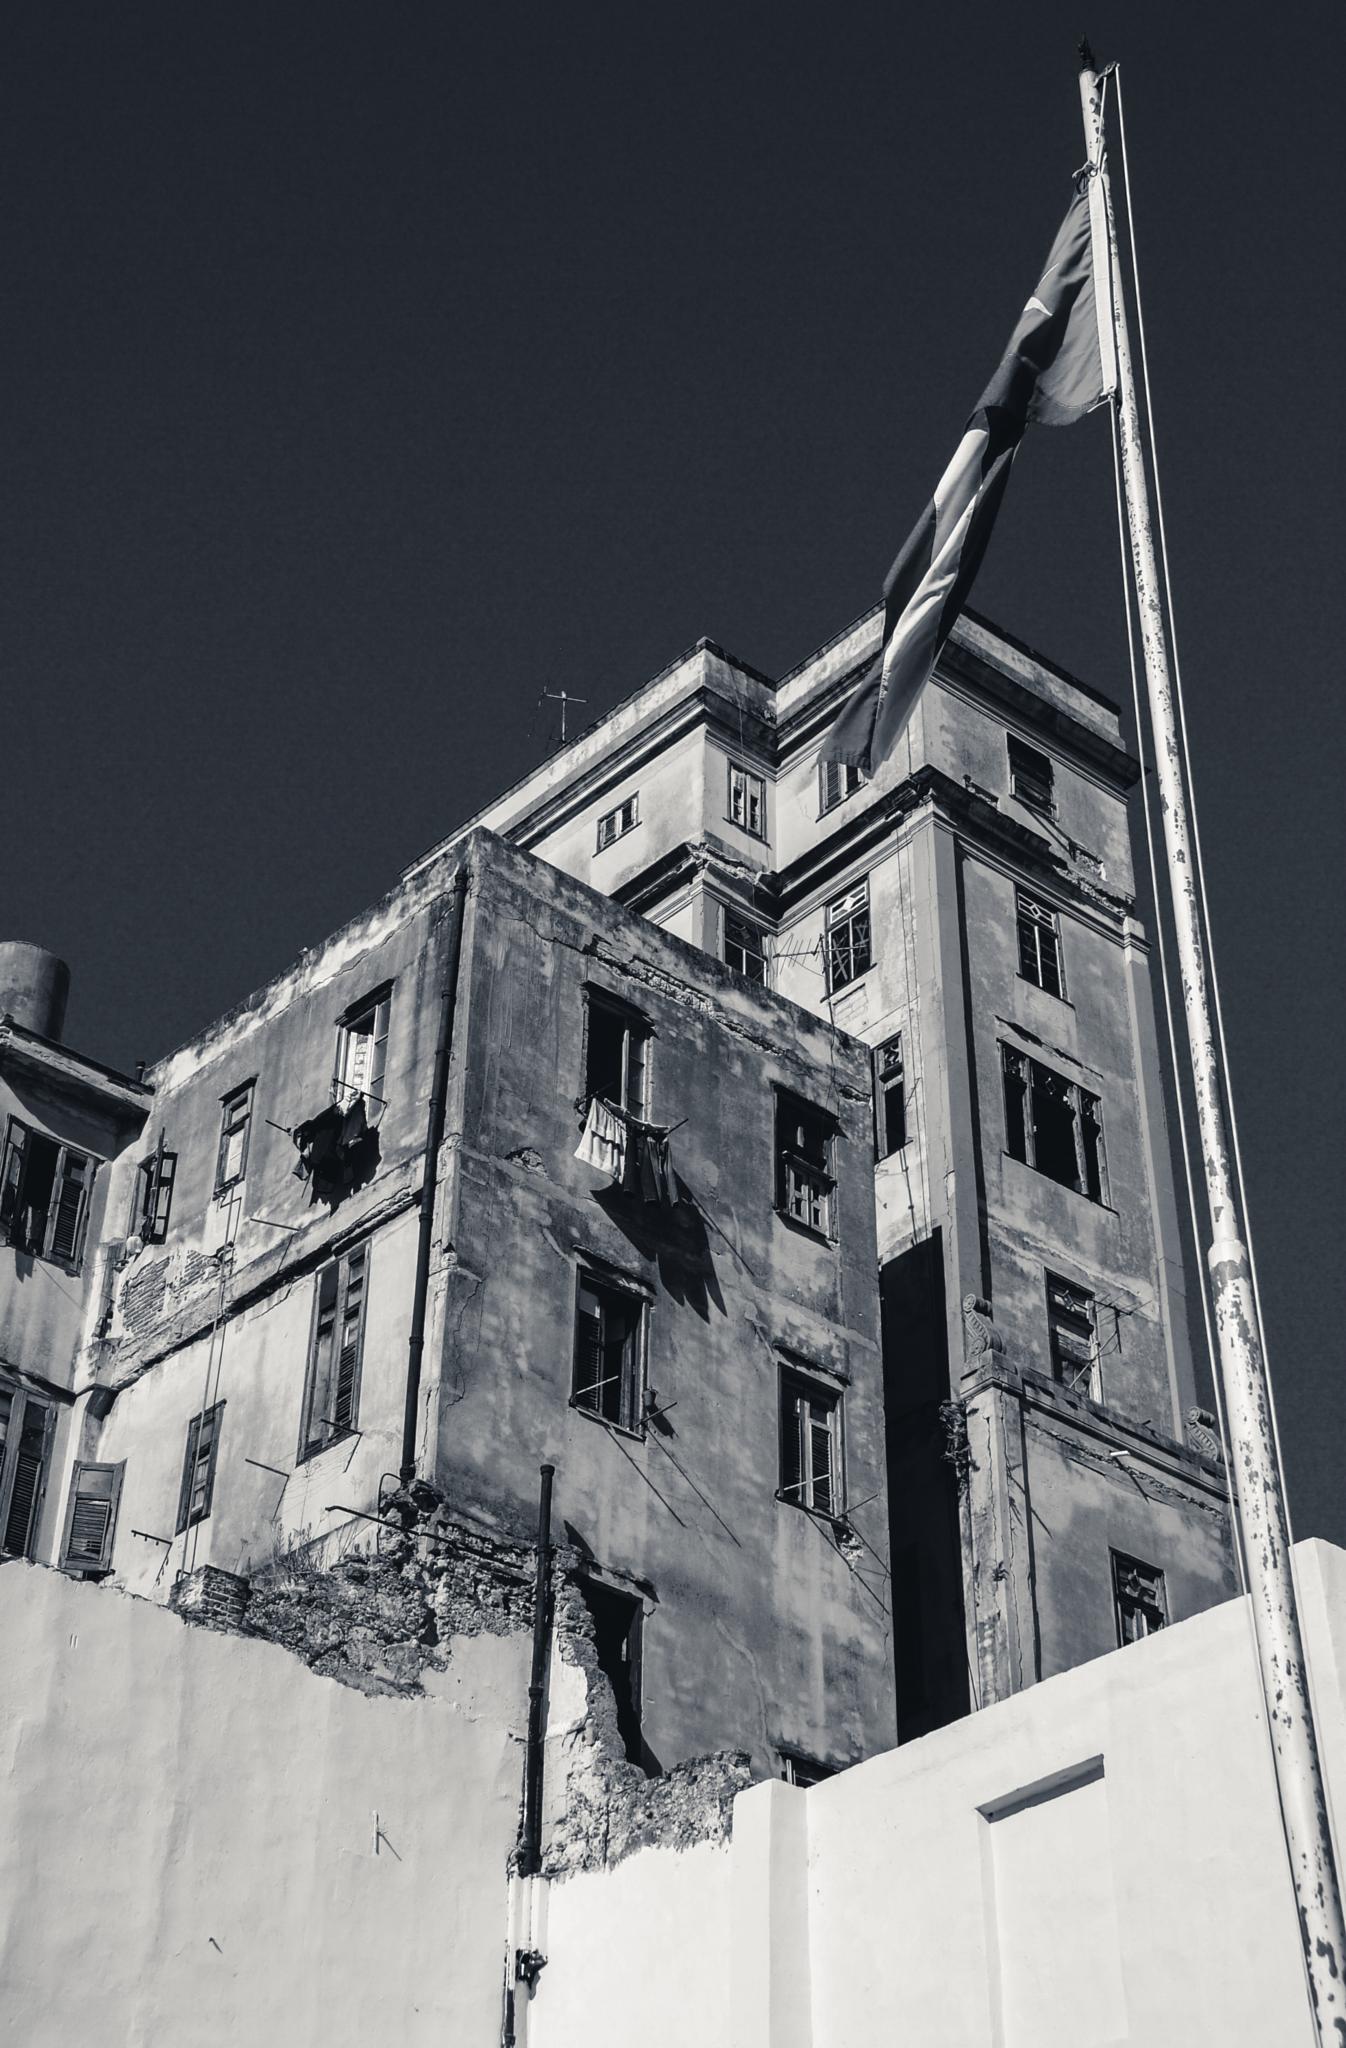 The feeling of Habana by Roman Khizhnyak